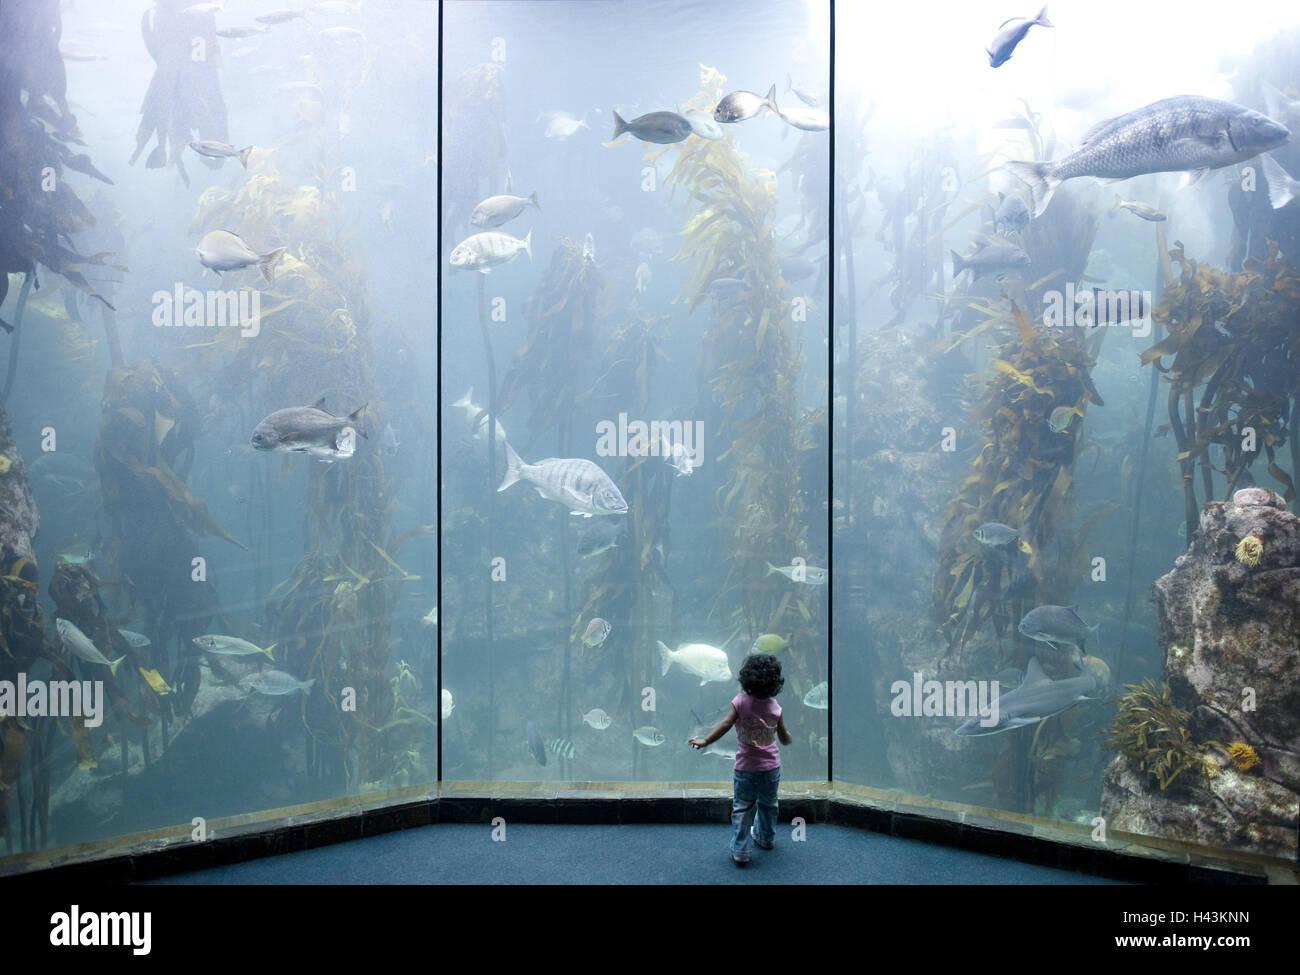 South Africa, Capetown, False Bay, Two Oceans Aquarium, visitors, - Stock Image